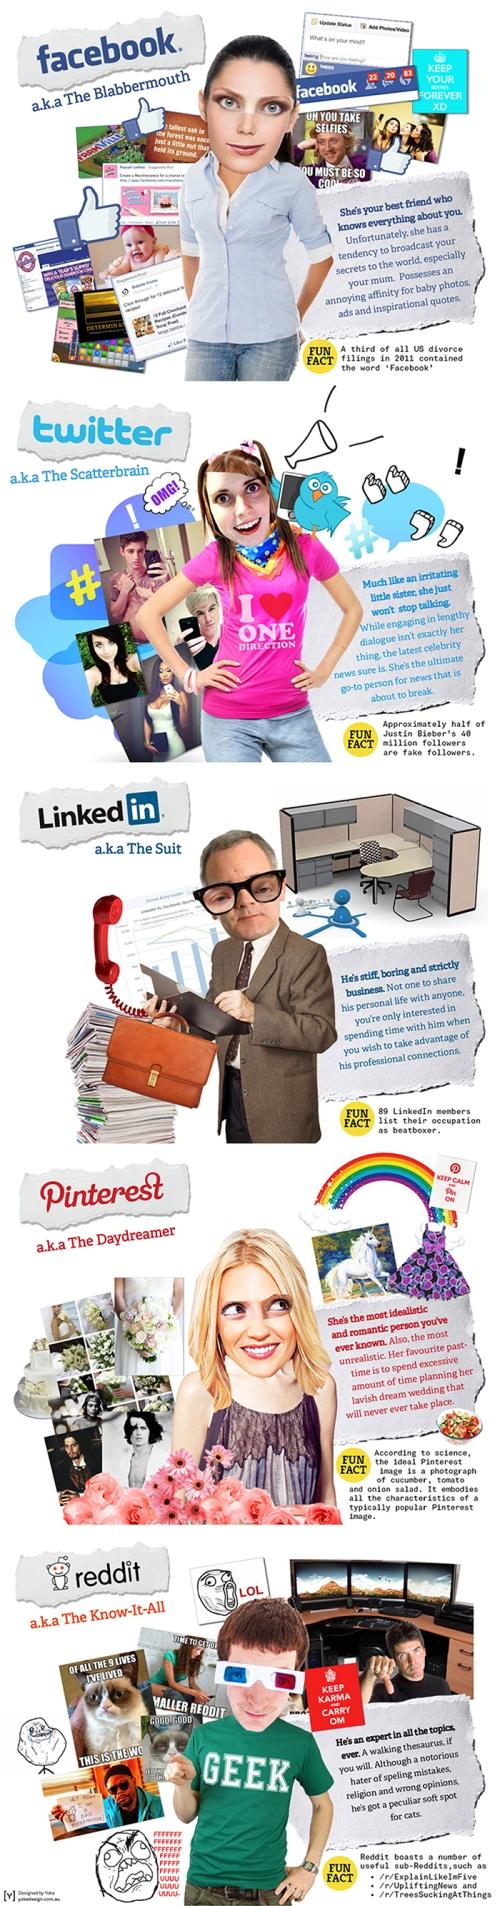 social-media-platforms-as-real-people_51d271956664b